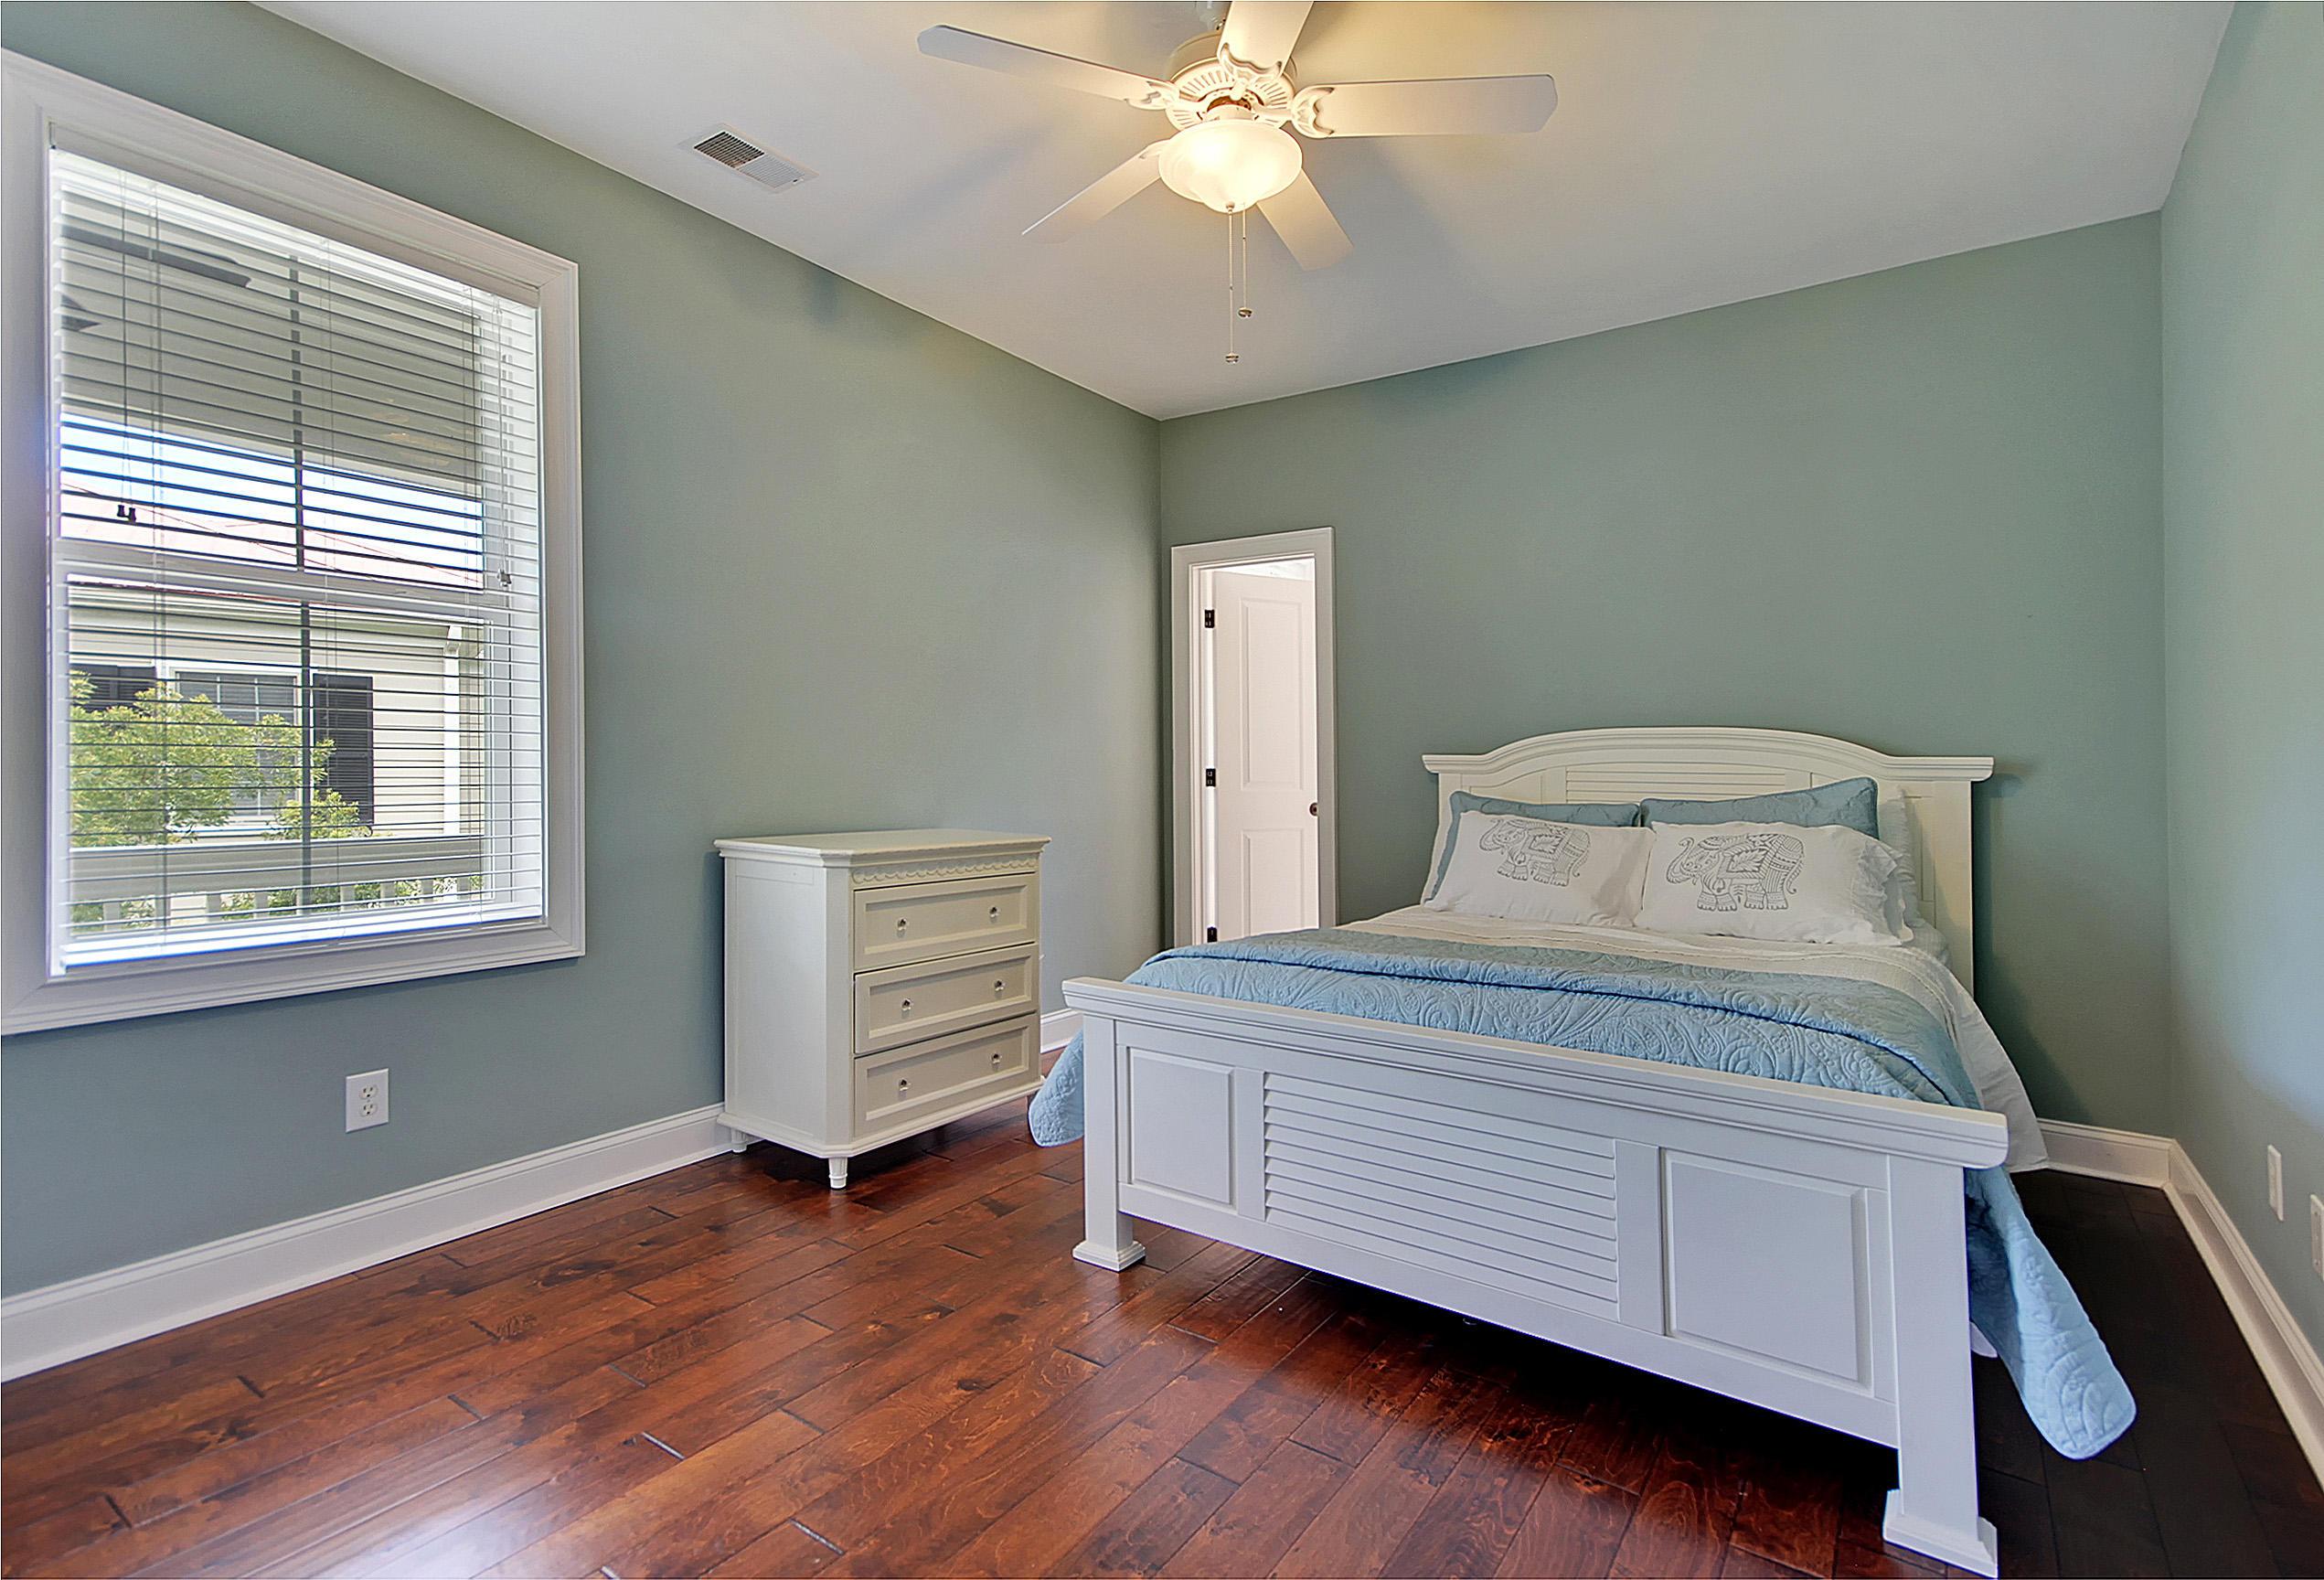 Belle Hall Homes For Sale - 368 Evian, Mount Pleasant, SC - 33